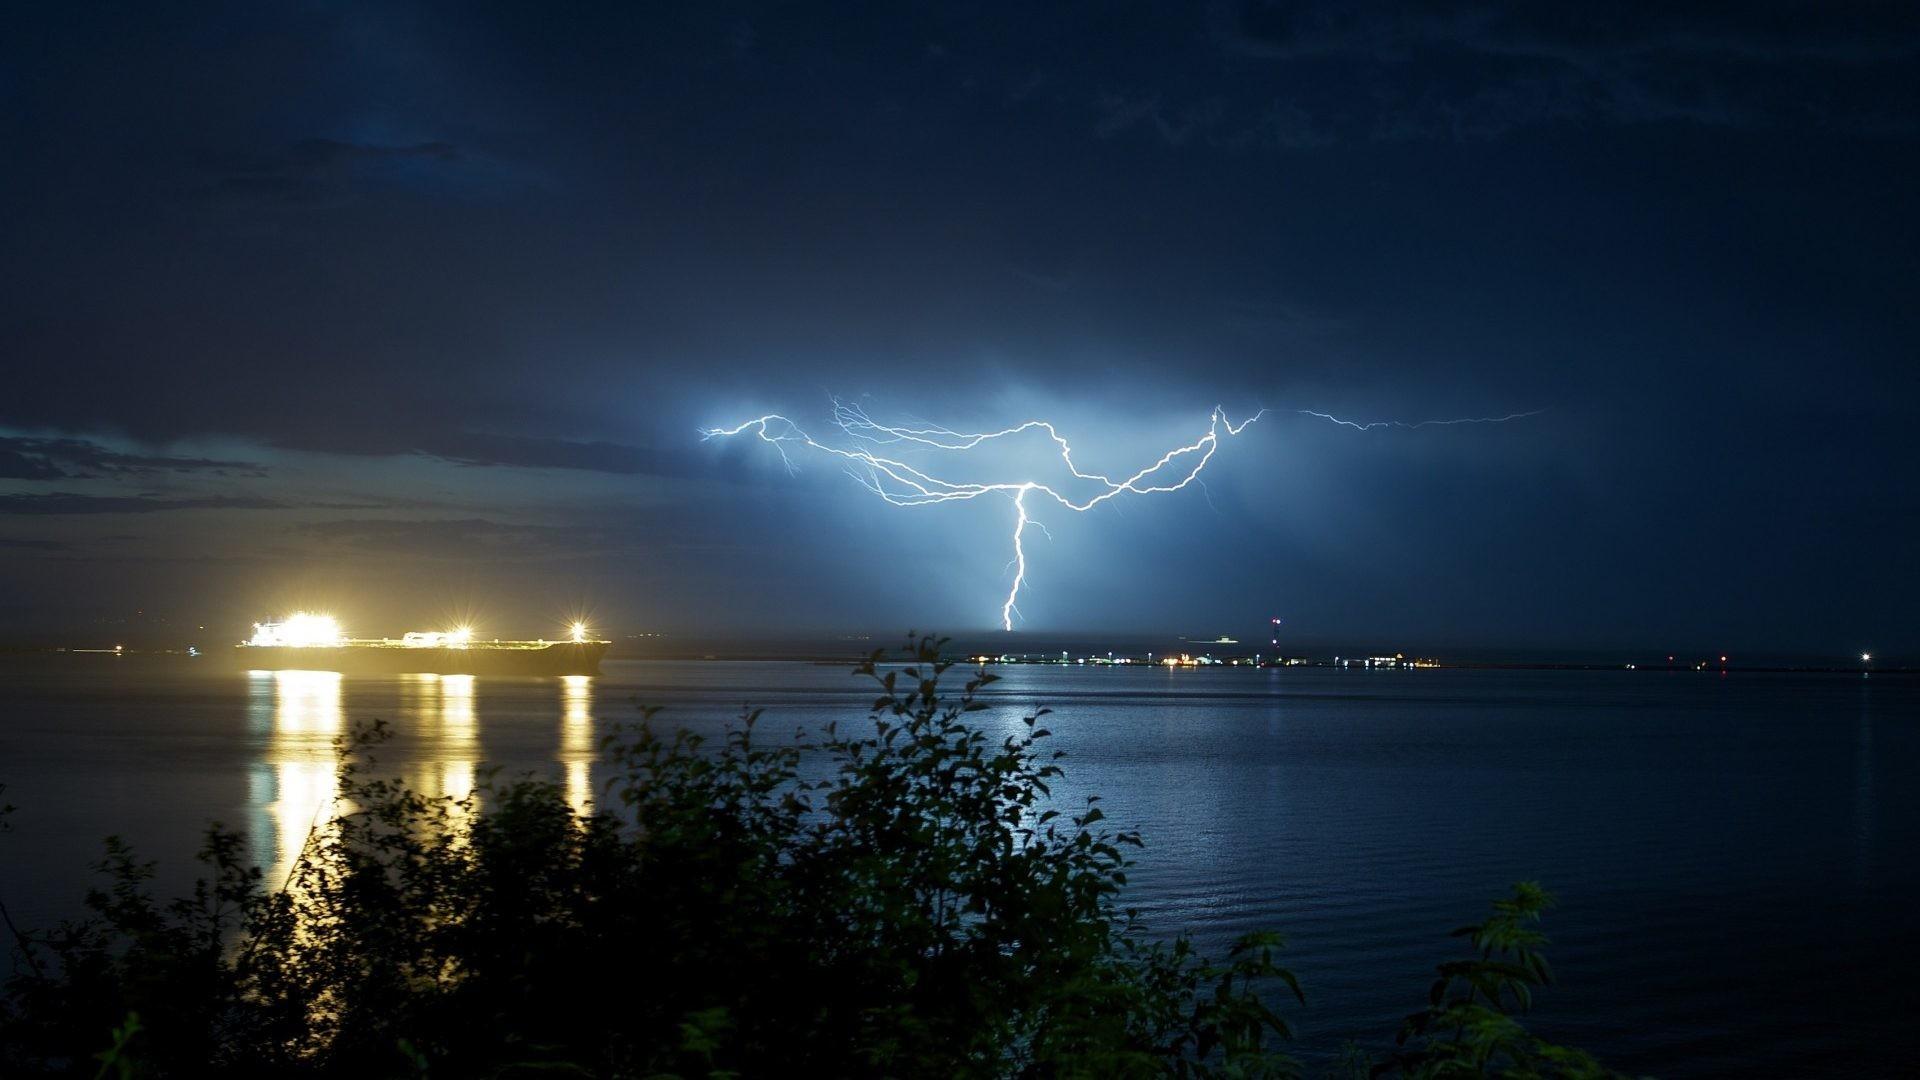 Lightning Tag – Ocean Lights Water Home Night Lightning Reflection Sea  Storm Trees Tree Leaves Sky